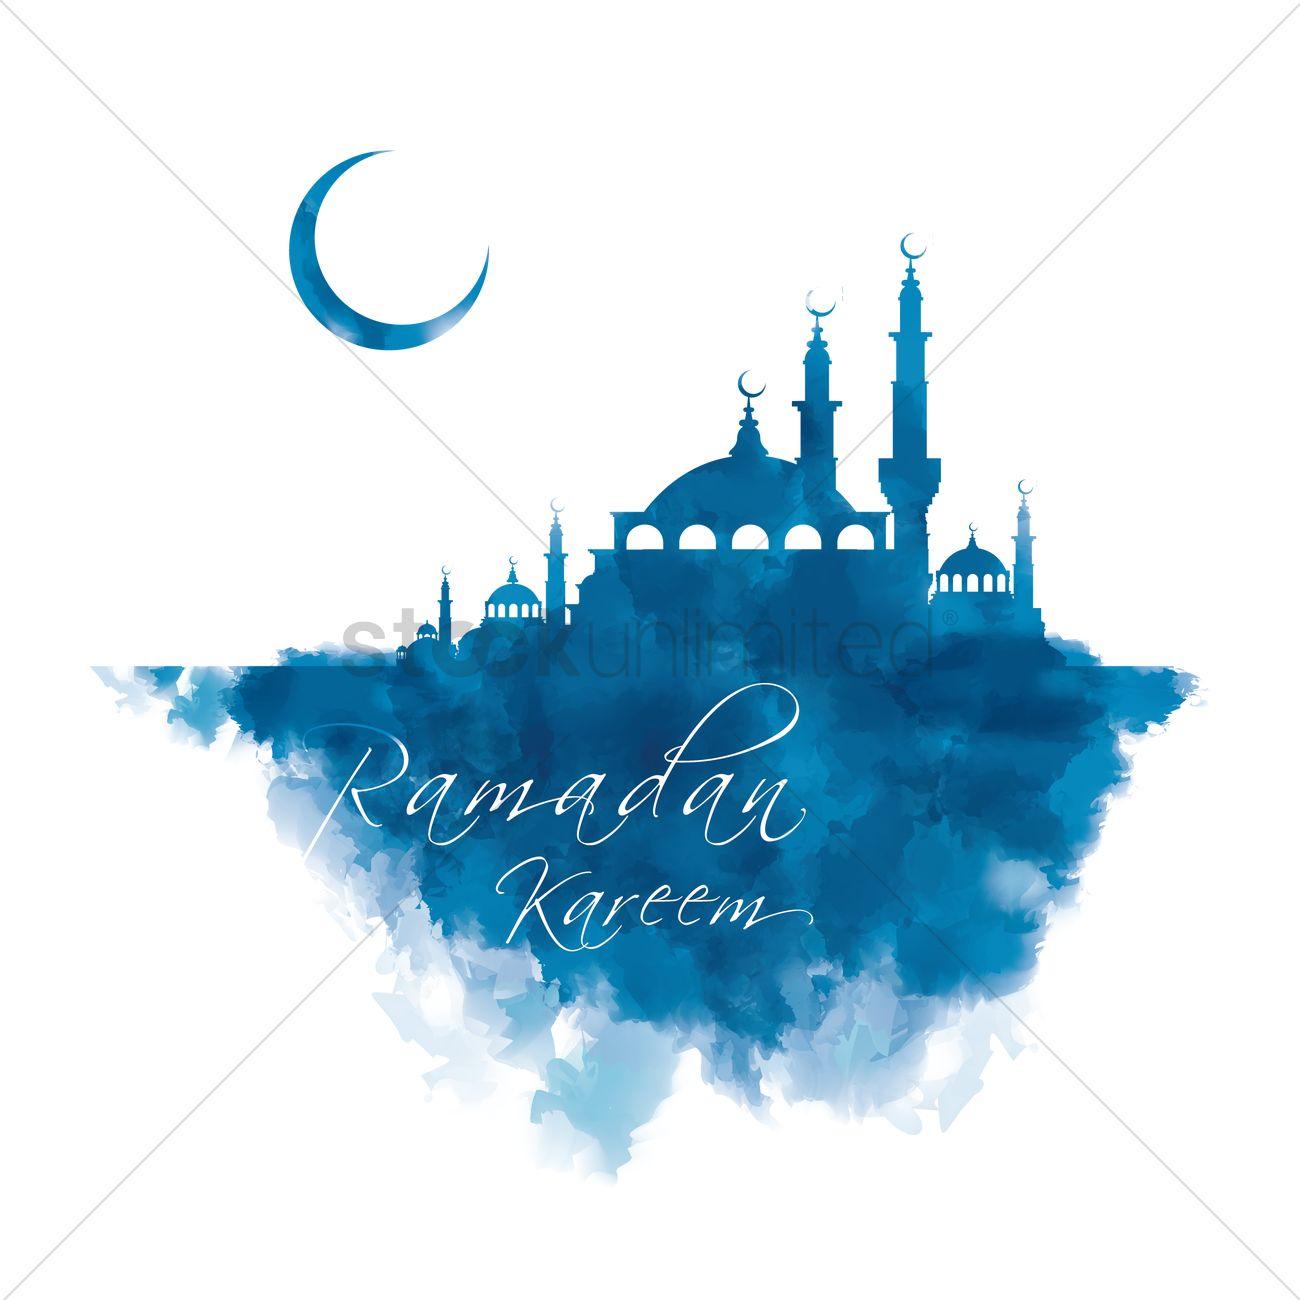 Ramadan kareem greeting vector image 1826928 stockunlimited ramadan kareem greeting vector graphic kristyandbryce Images